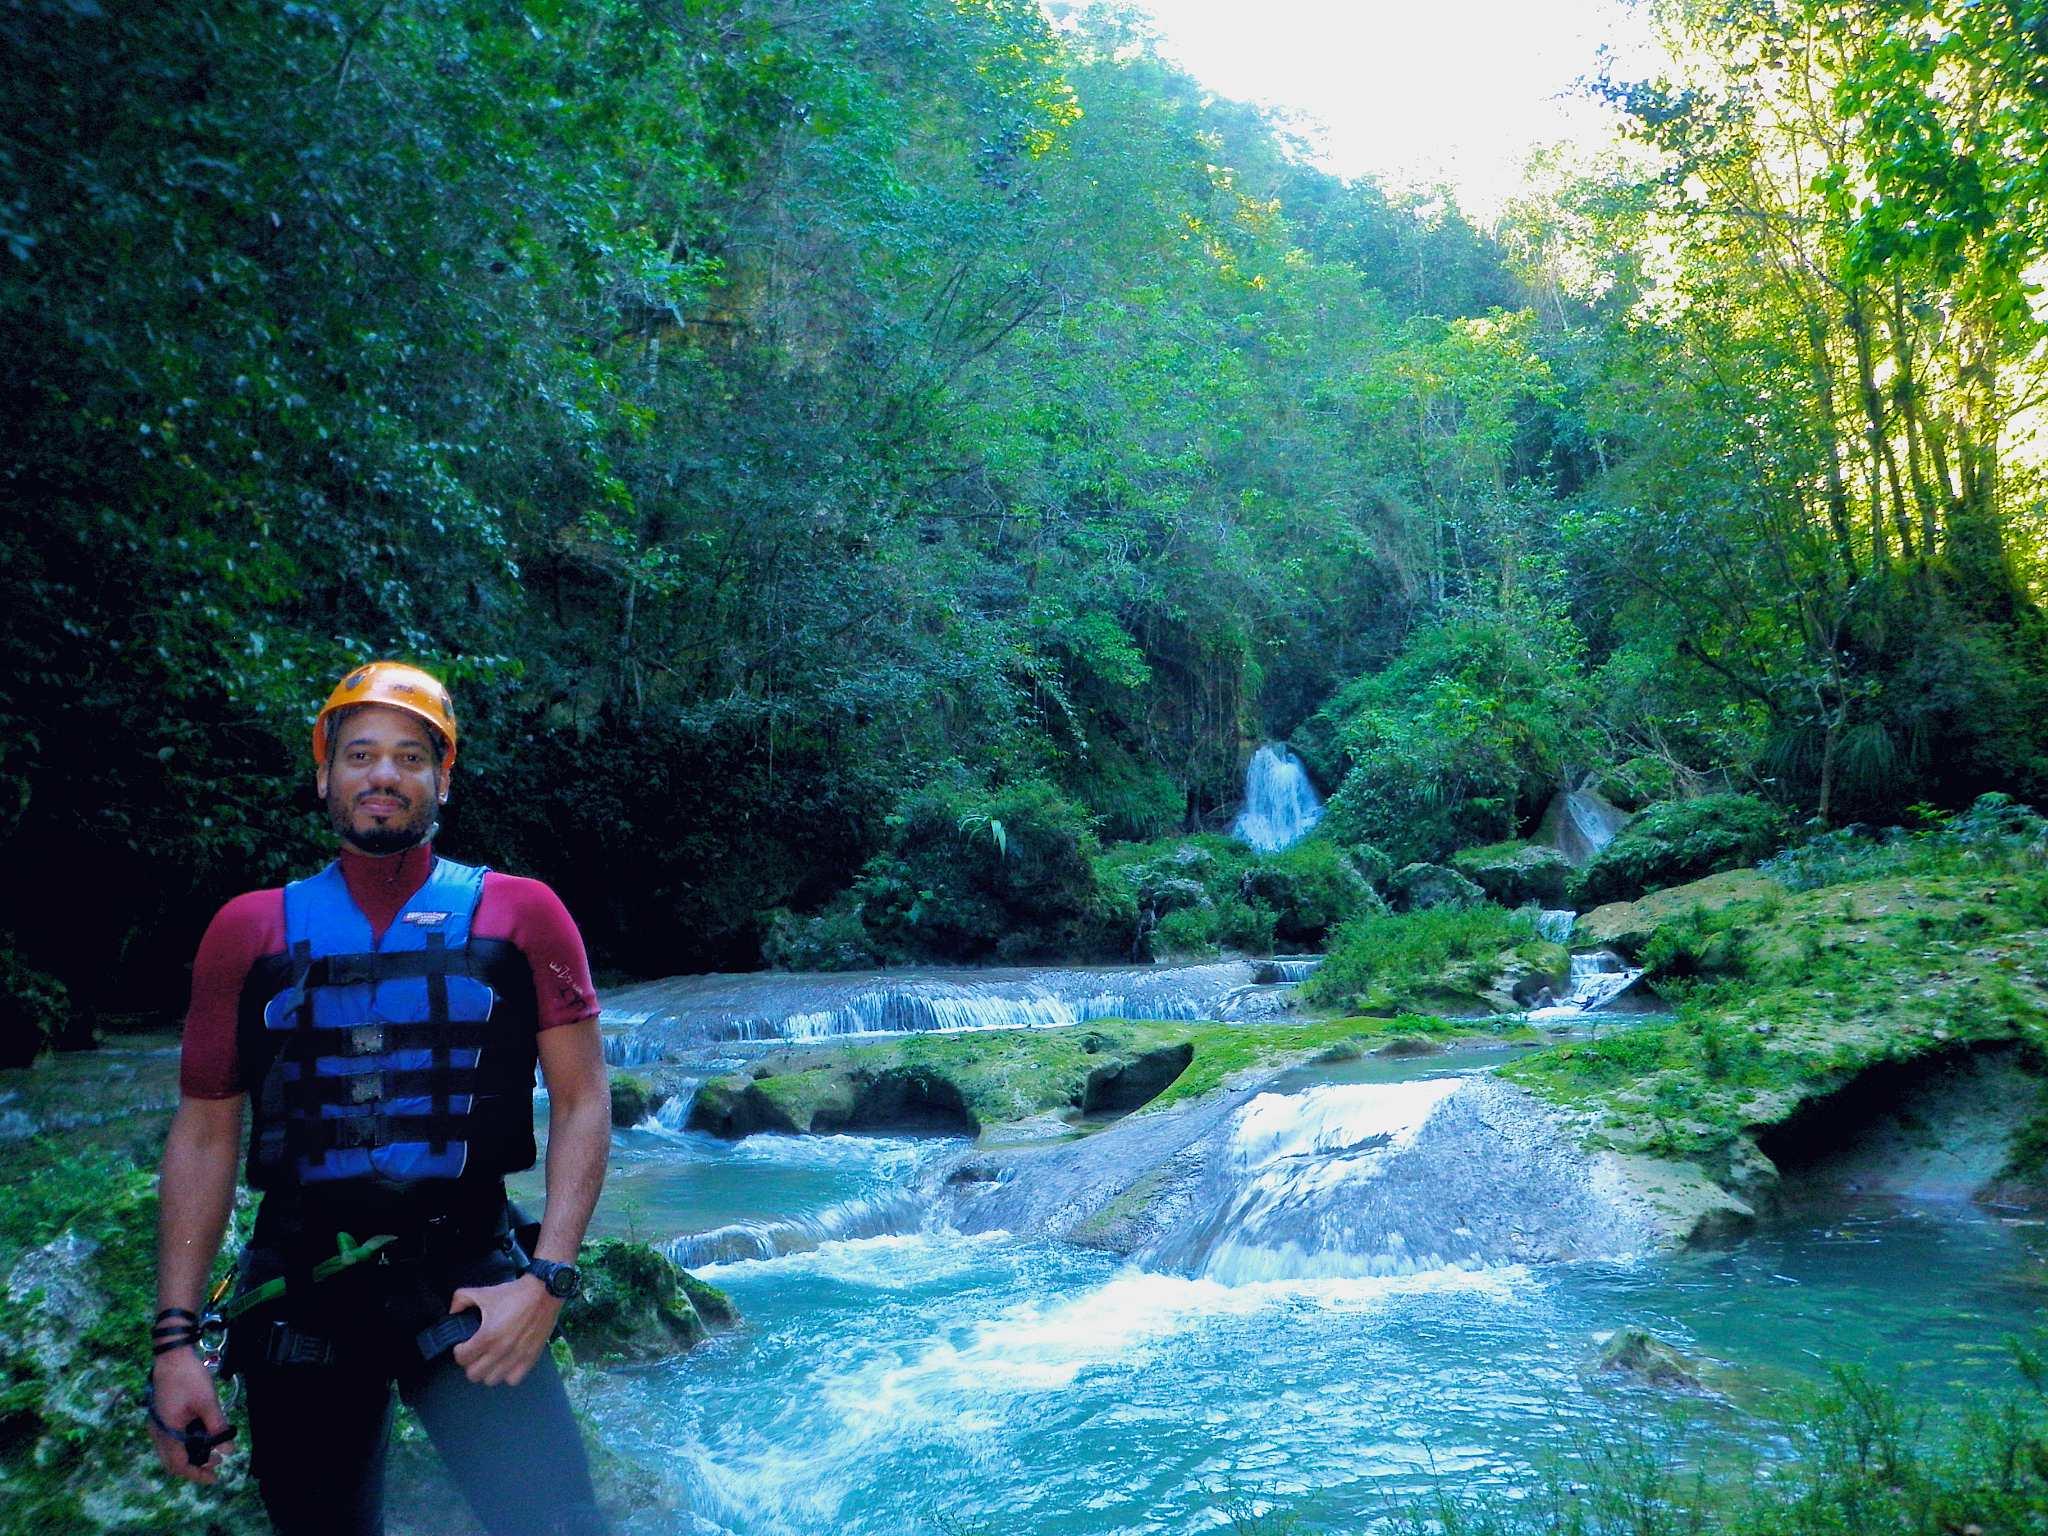 On Site Cabarete Canyoning Ciguapa Falls With Iguana Mama Adventure Tours Cabarete Dominican